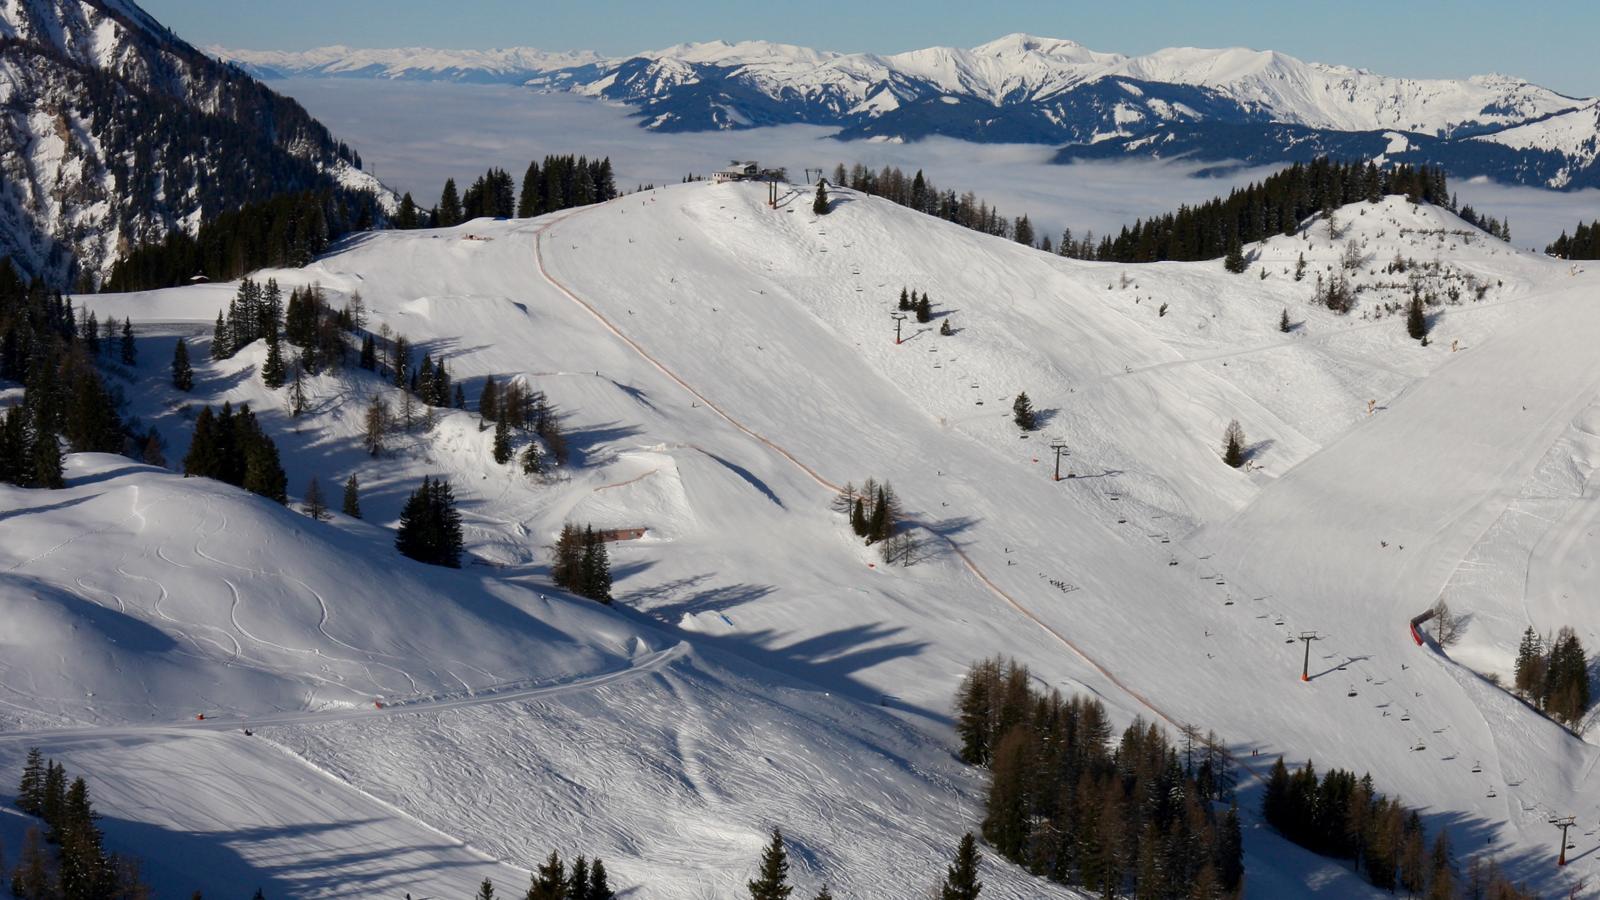 Betterpark Alpendorf: Overview